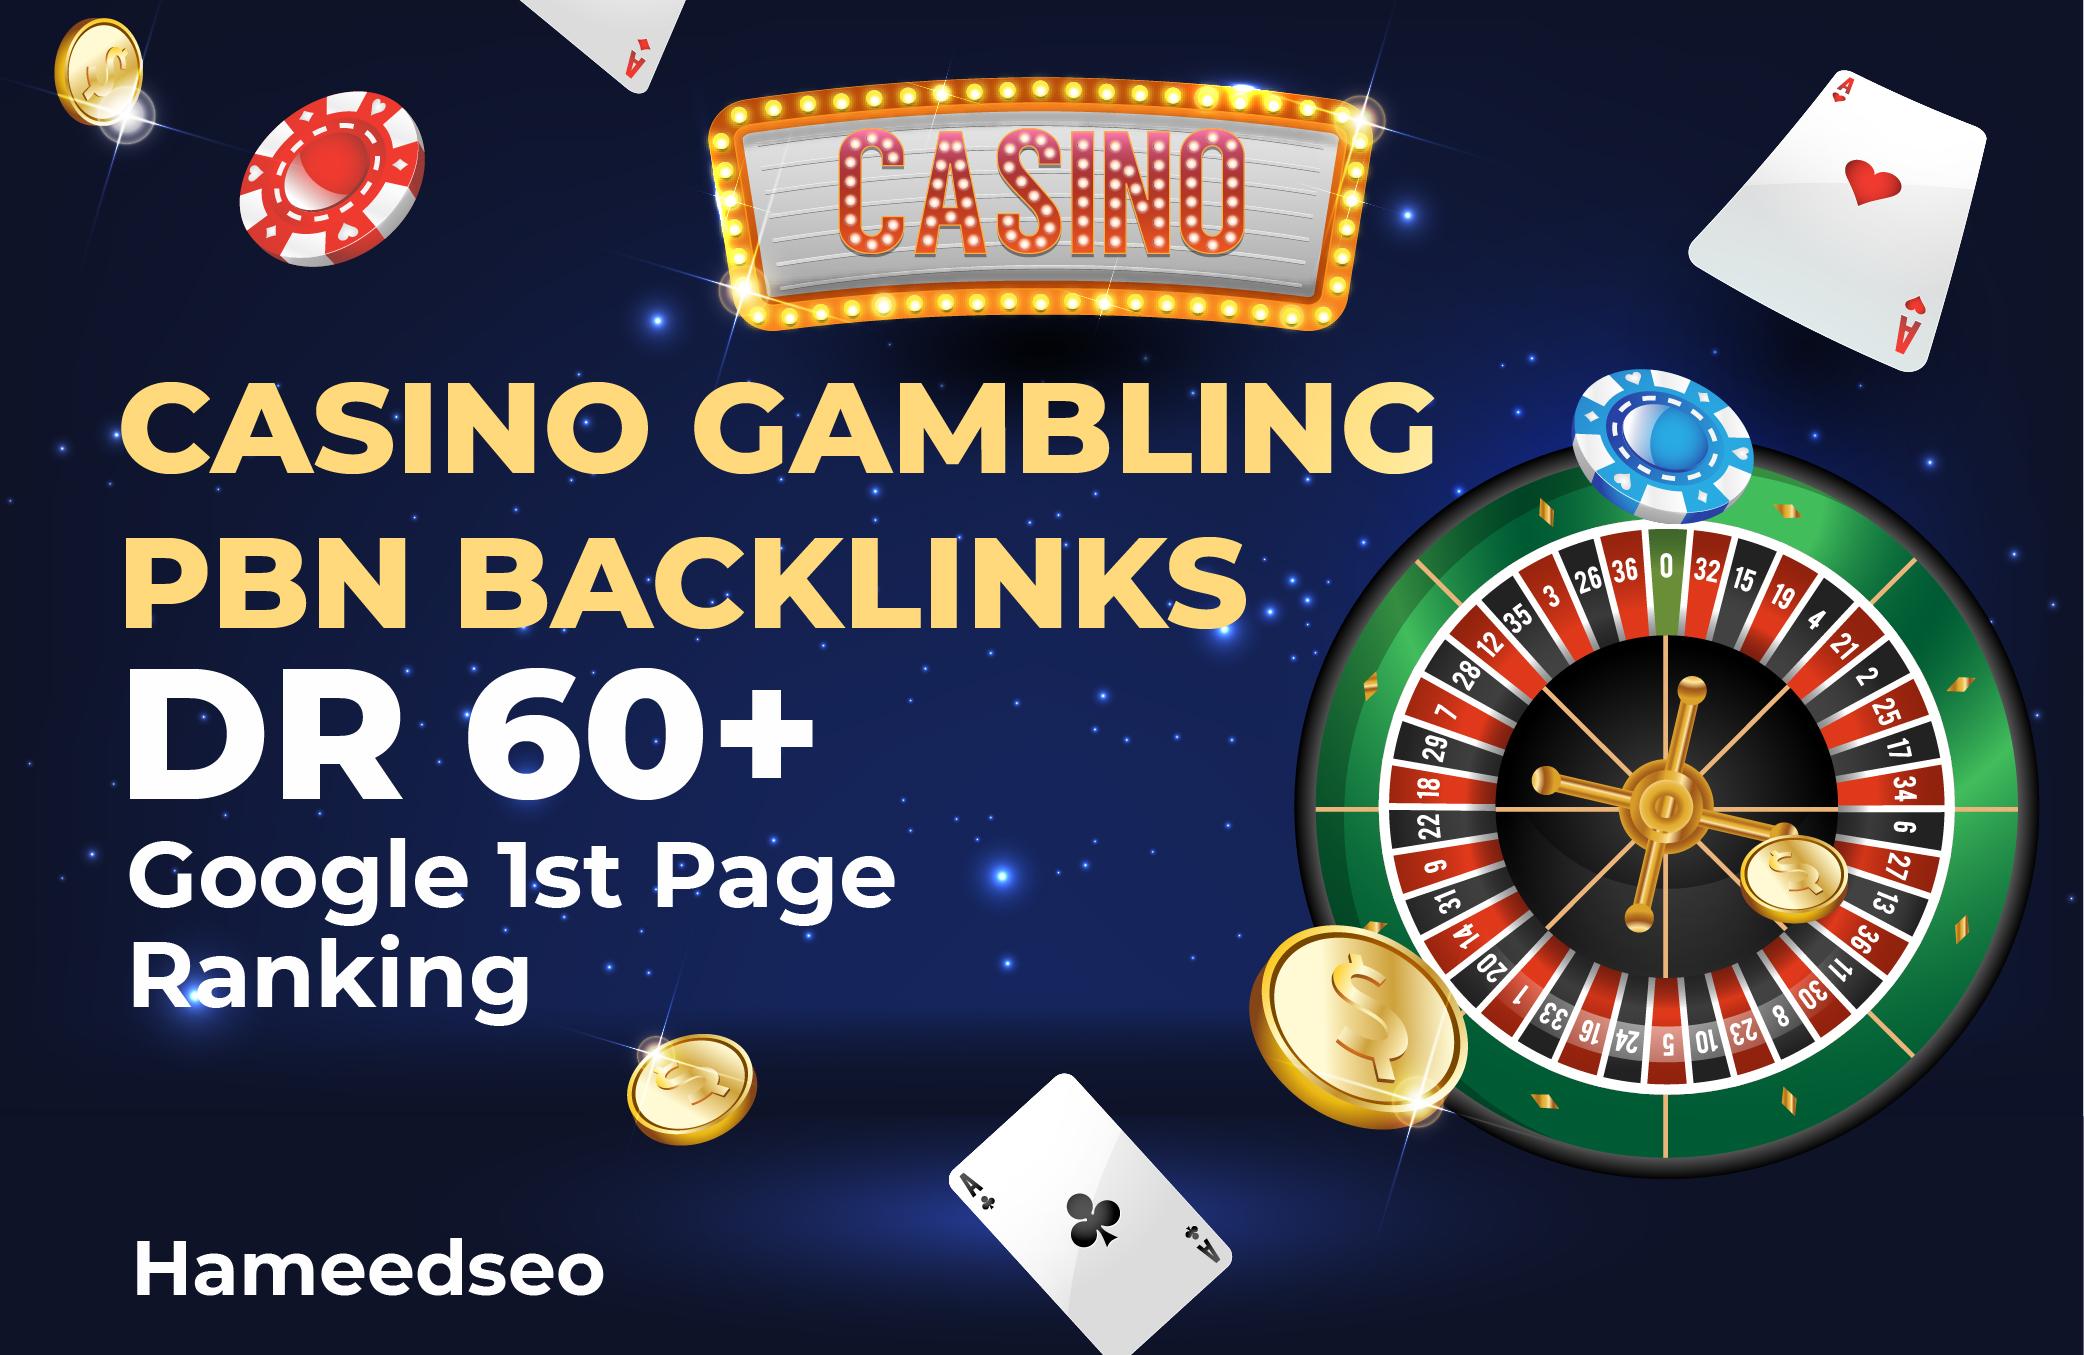 Build Casino Posts Gambling Poker 20 Pbn DR 60 plus Dofollow High Quality Backlinks